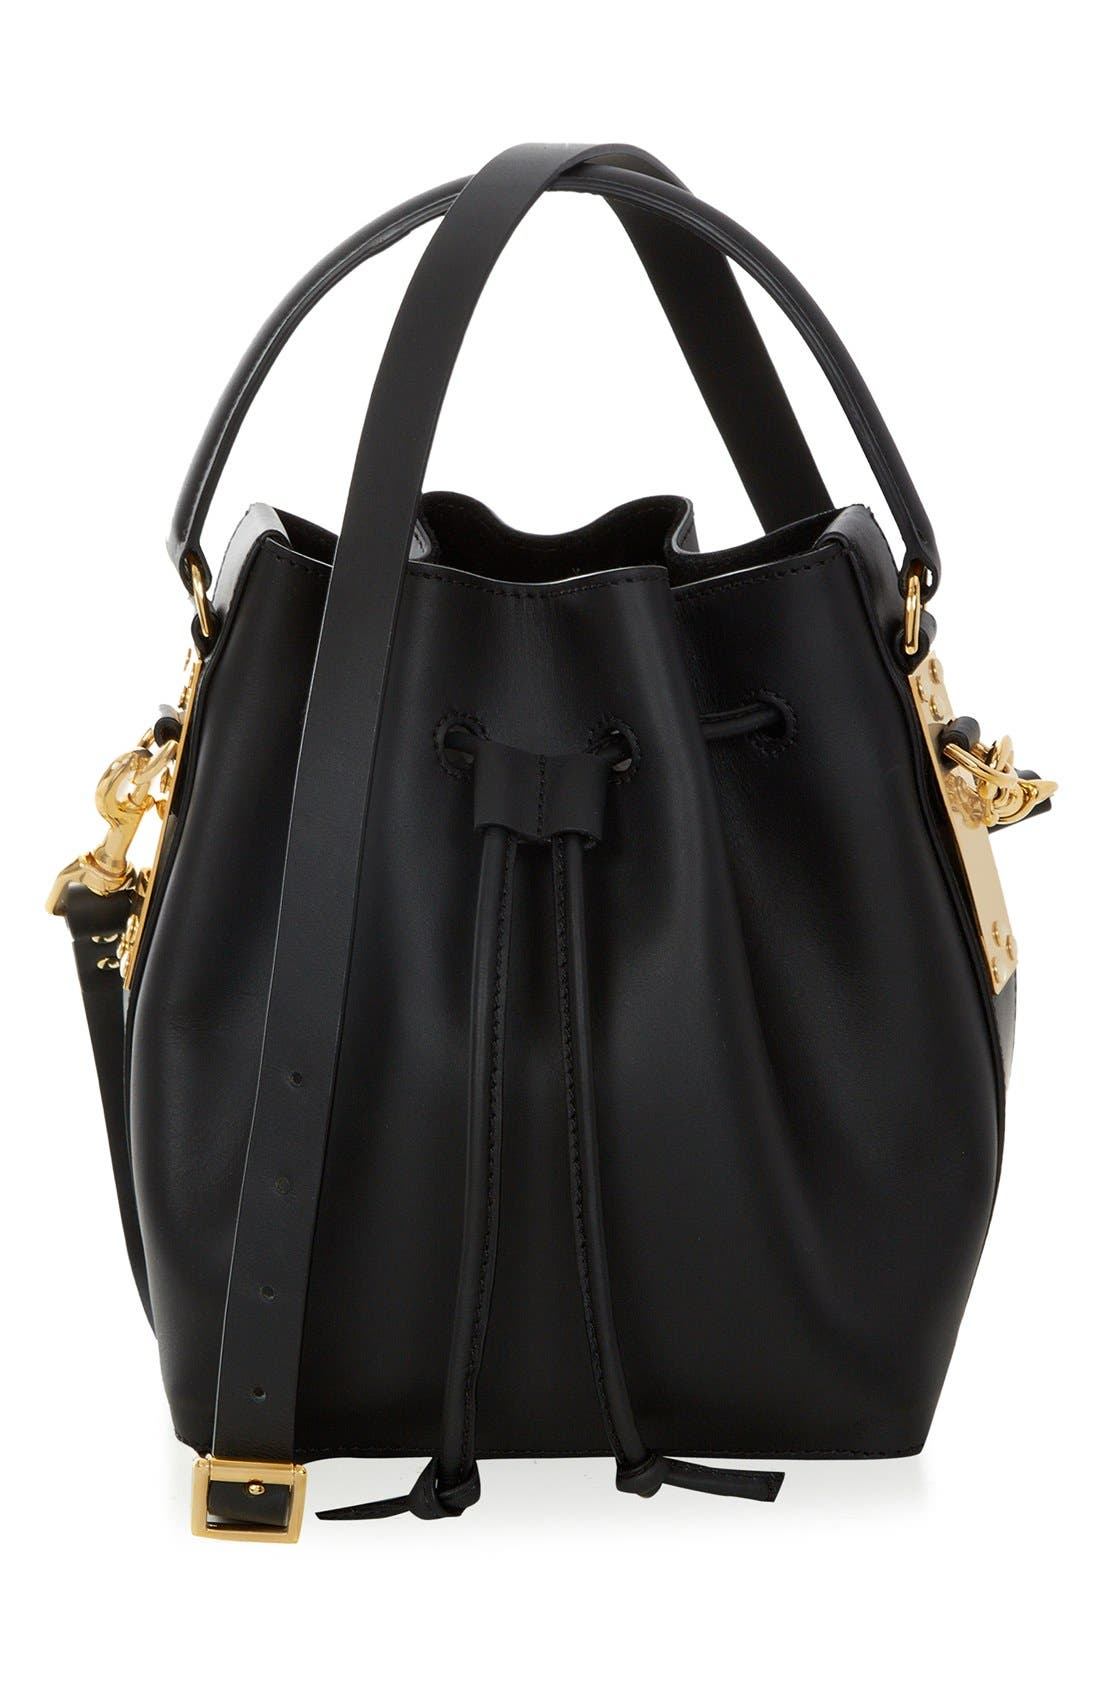 Main Image - Sophie Hulme 'Small' Drawstring Leather Shoulder Bag